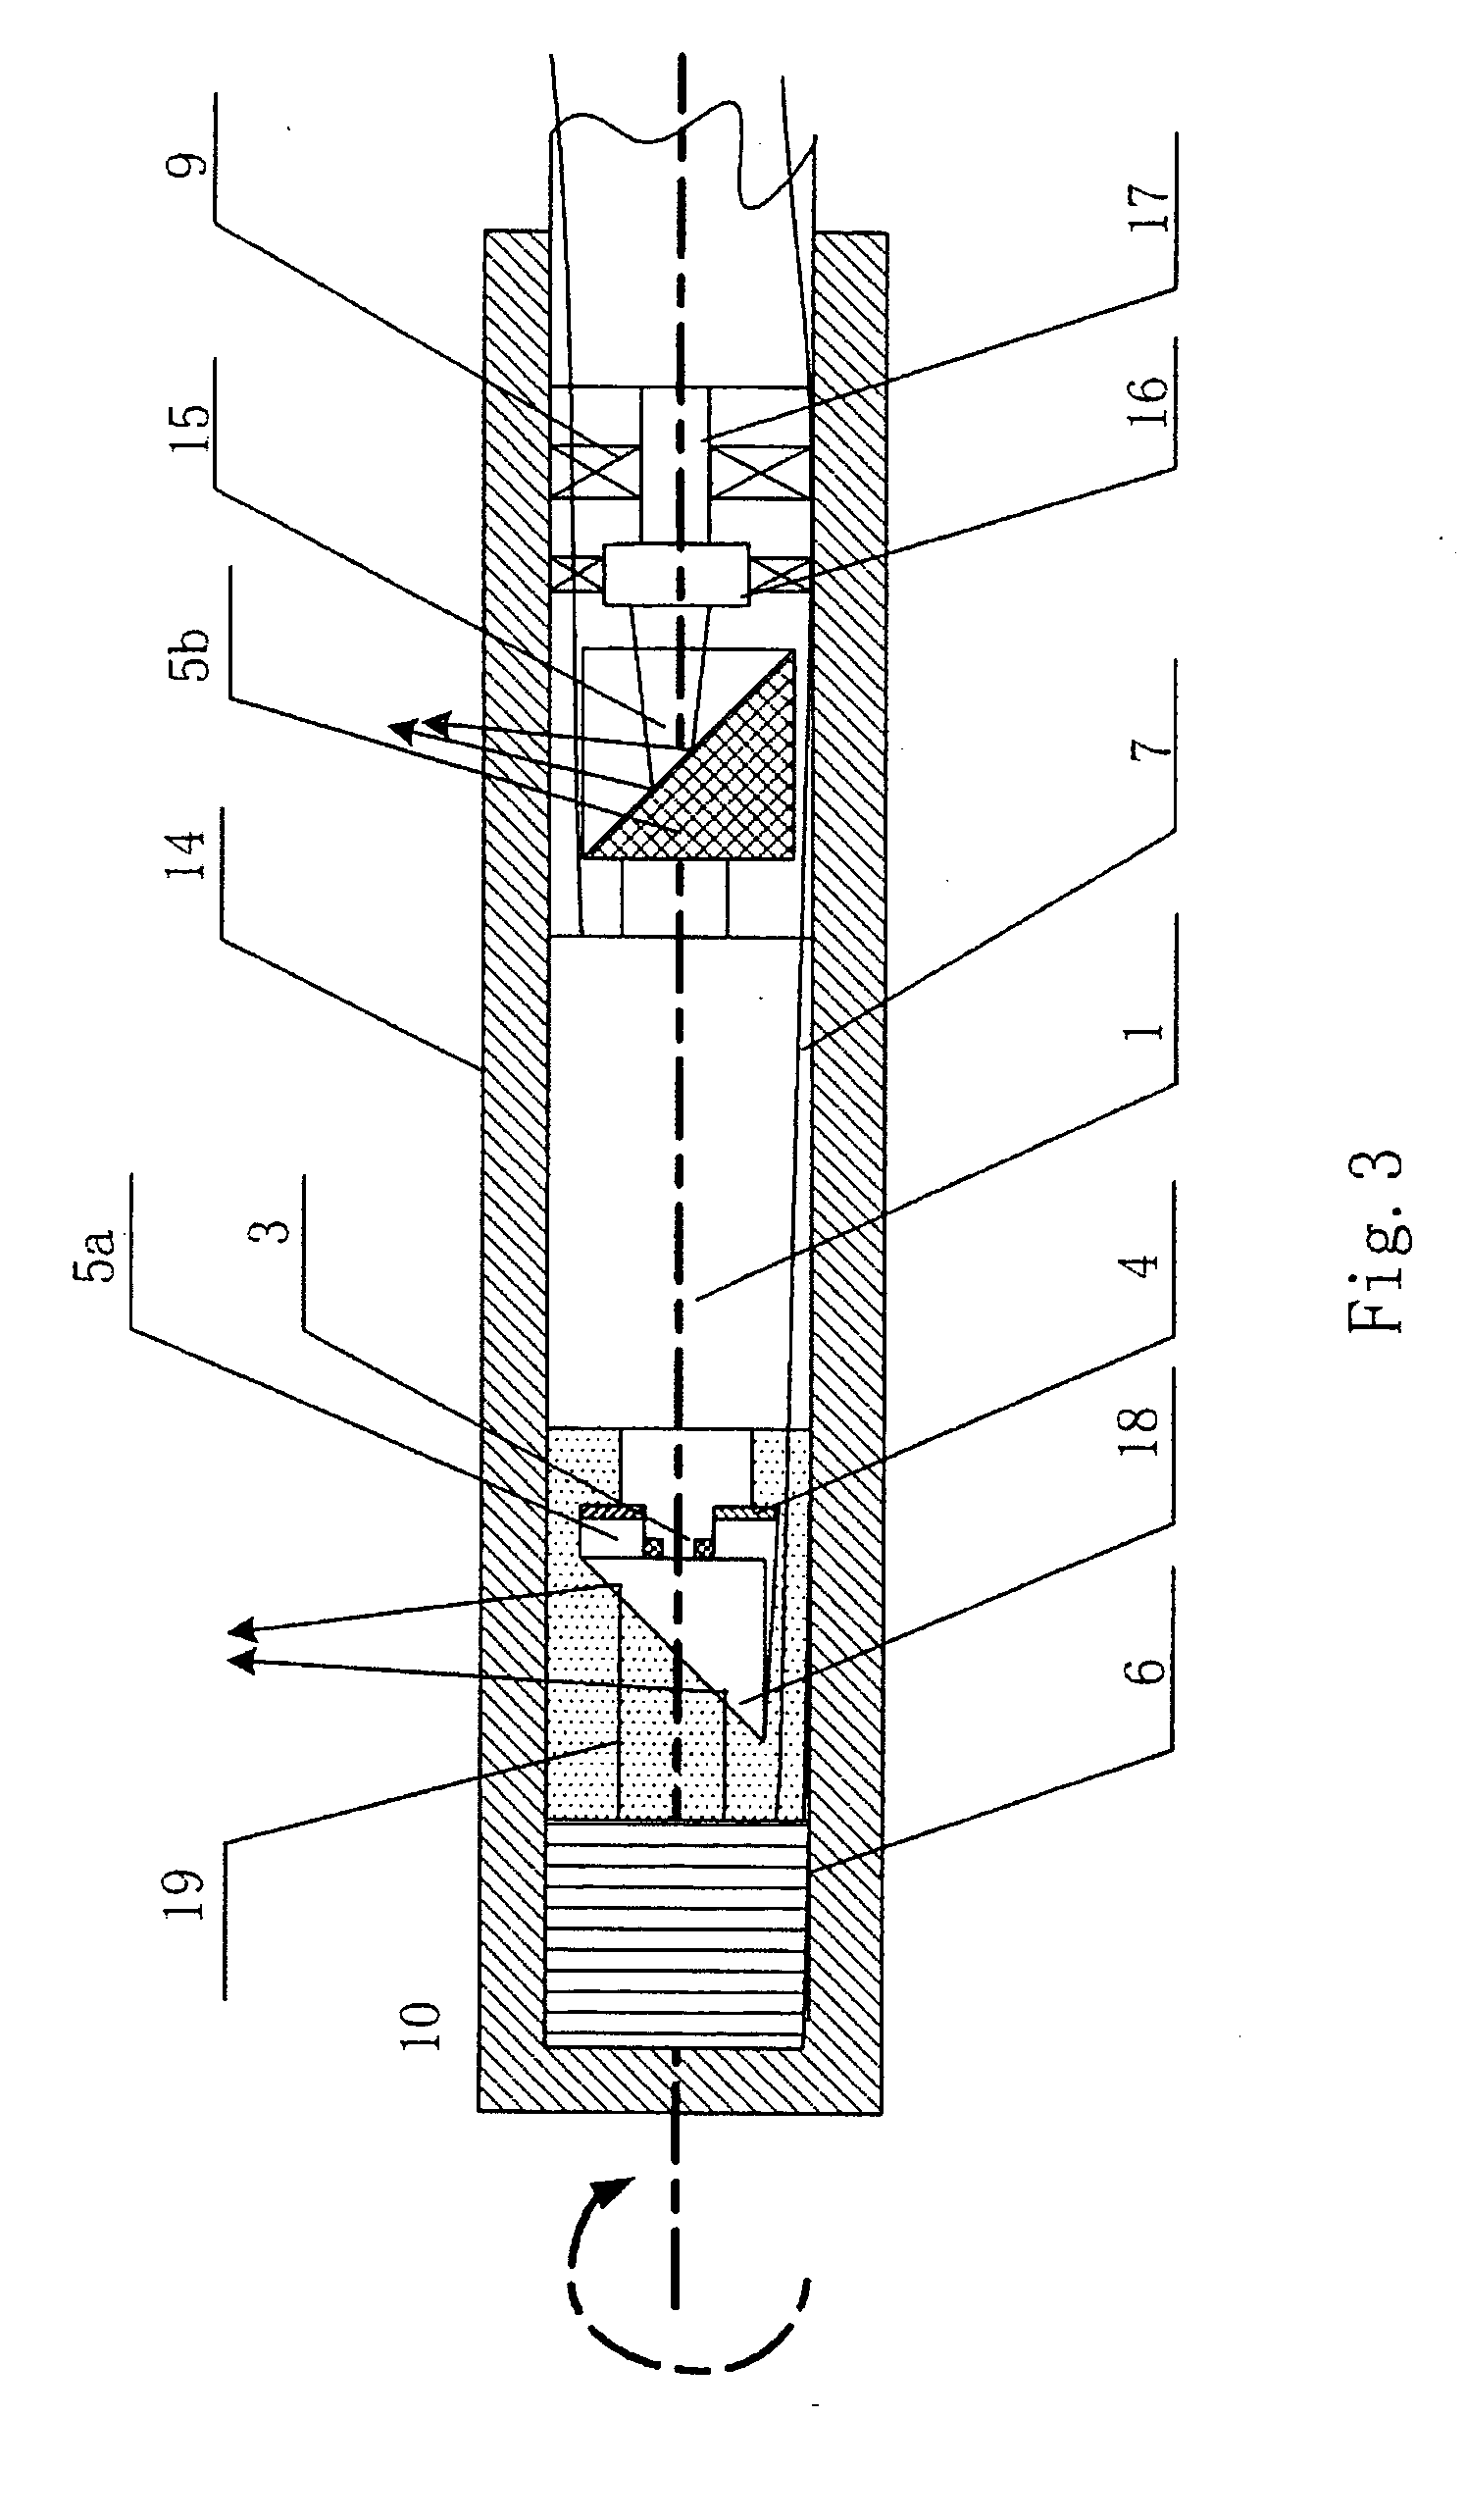 micro medical-ultrasonic endoscopic oct probe